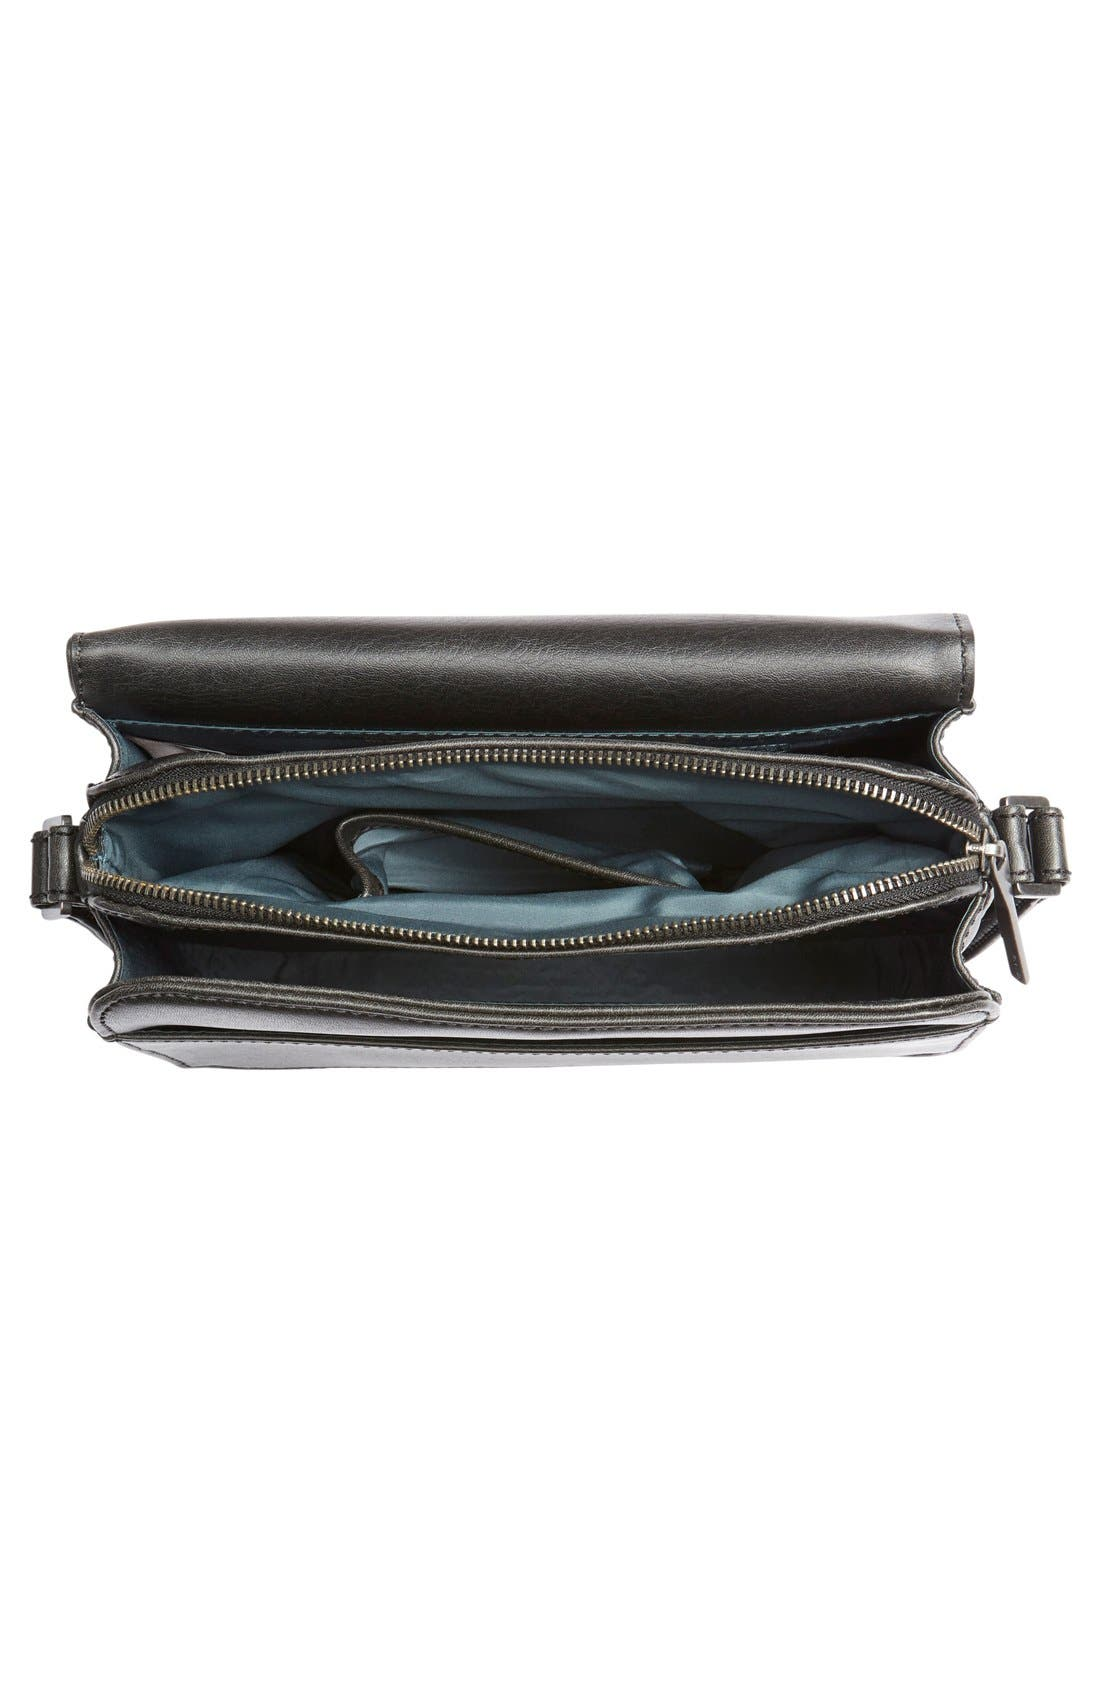 MATT & NAT 'Elle' Vegan Leather Crossbody Bag, Main, color, 001